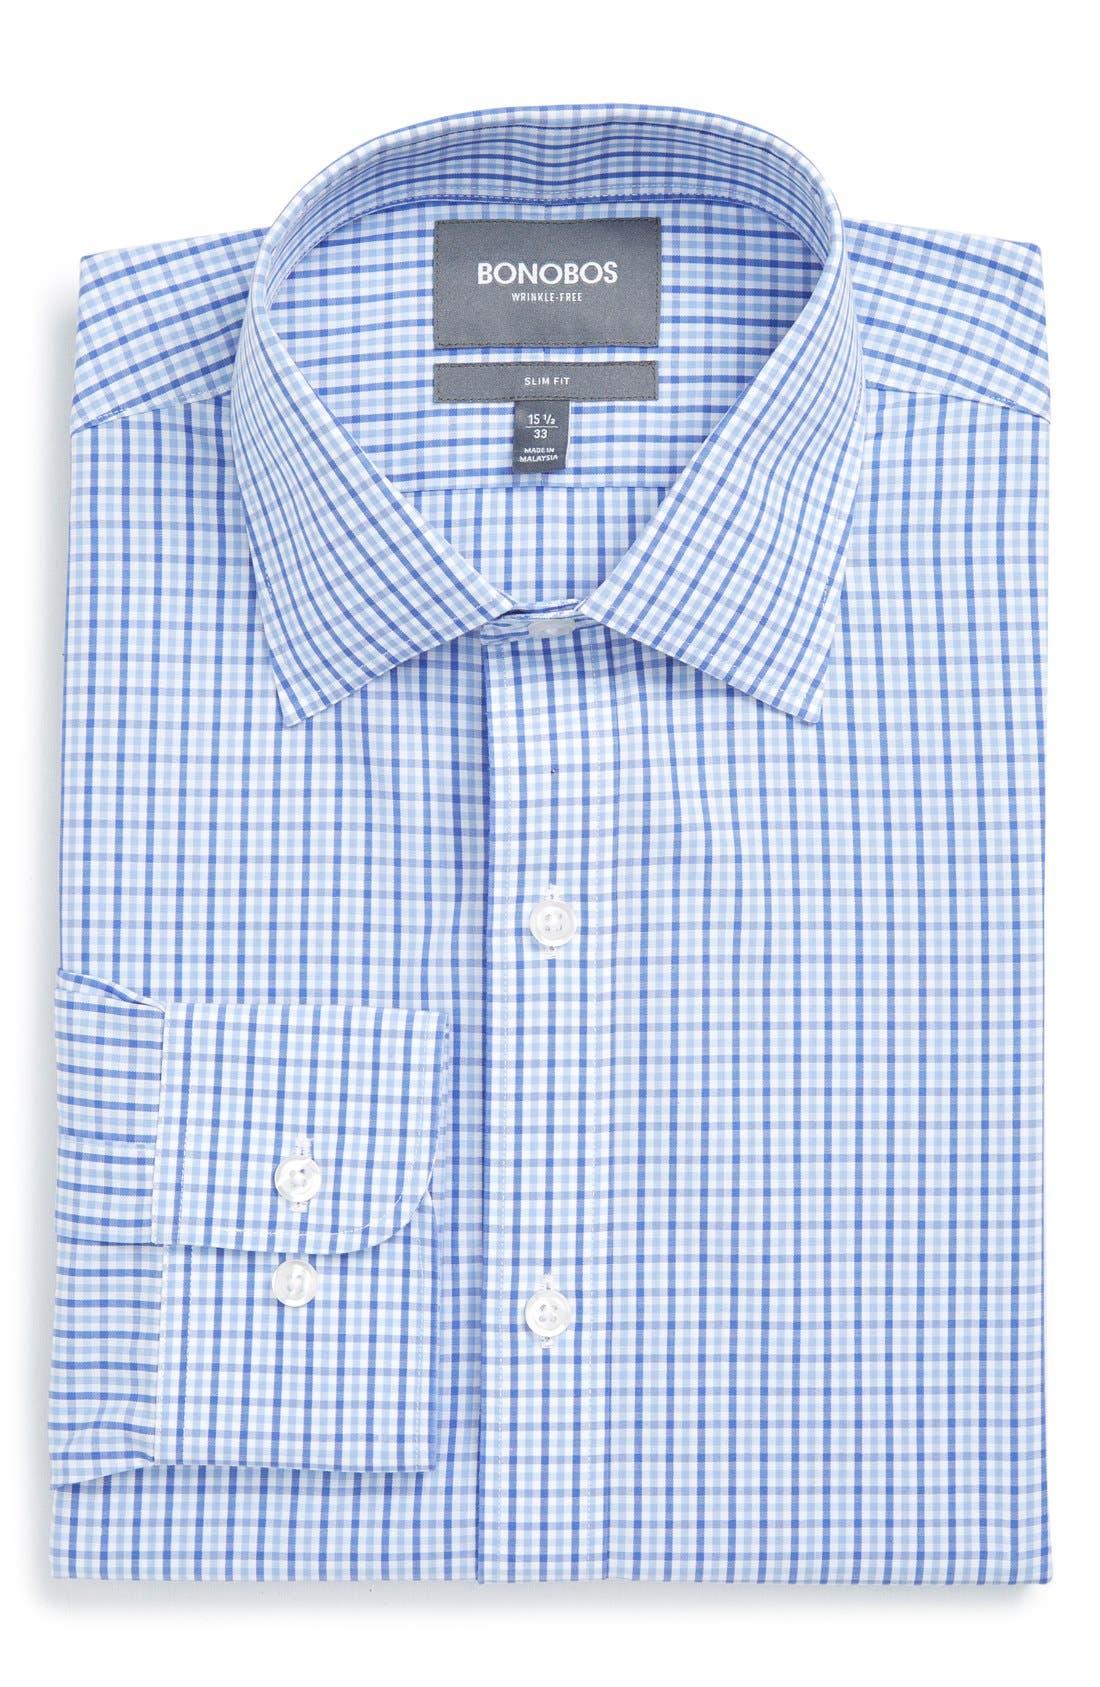 Slim Fit Wrinkle Free Check Dress Shirt,                             Main thumbnail 1, color,                             PALE BLUE